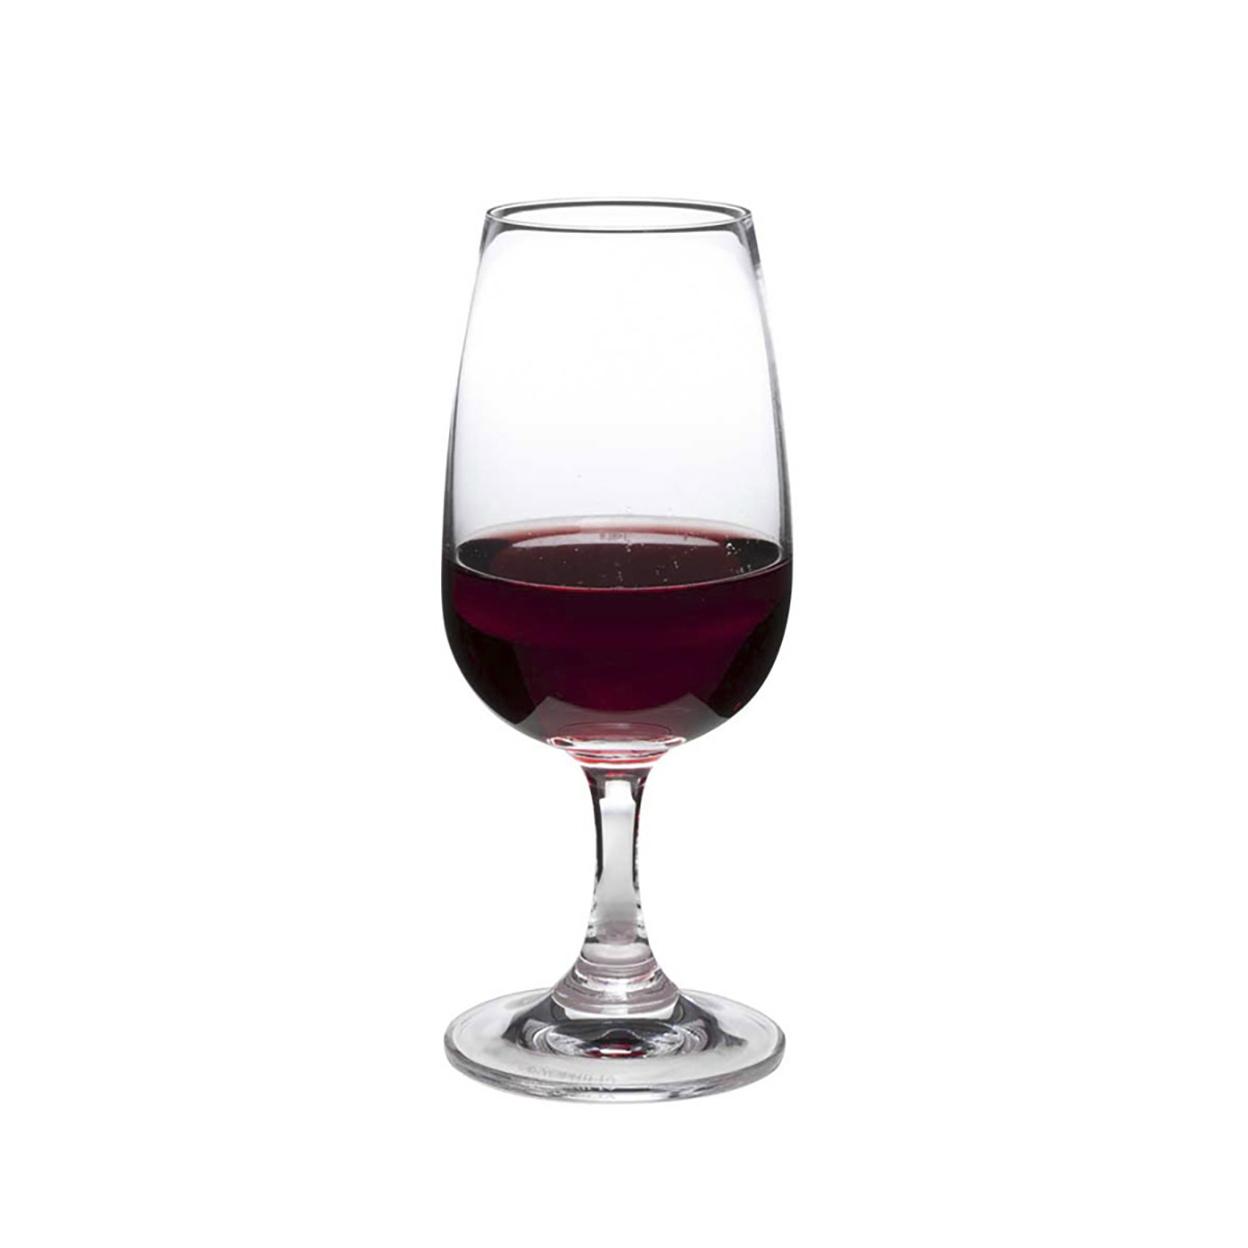 Set/6 Perfect Stemware, Tasting Glass 59d28d07e224615add0996ea